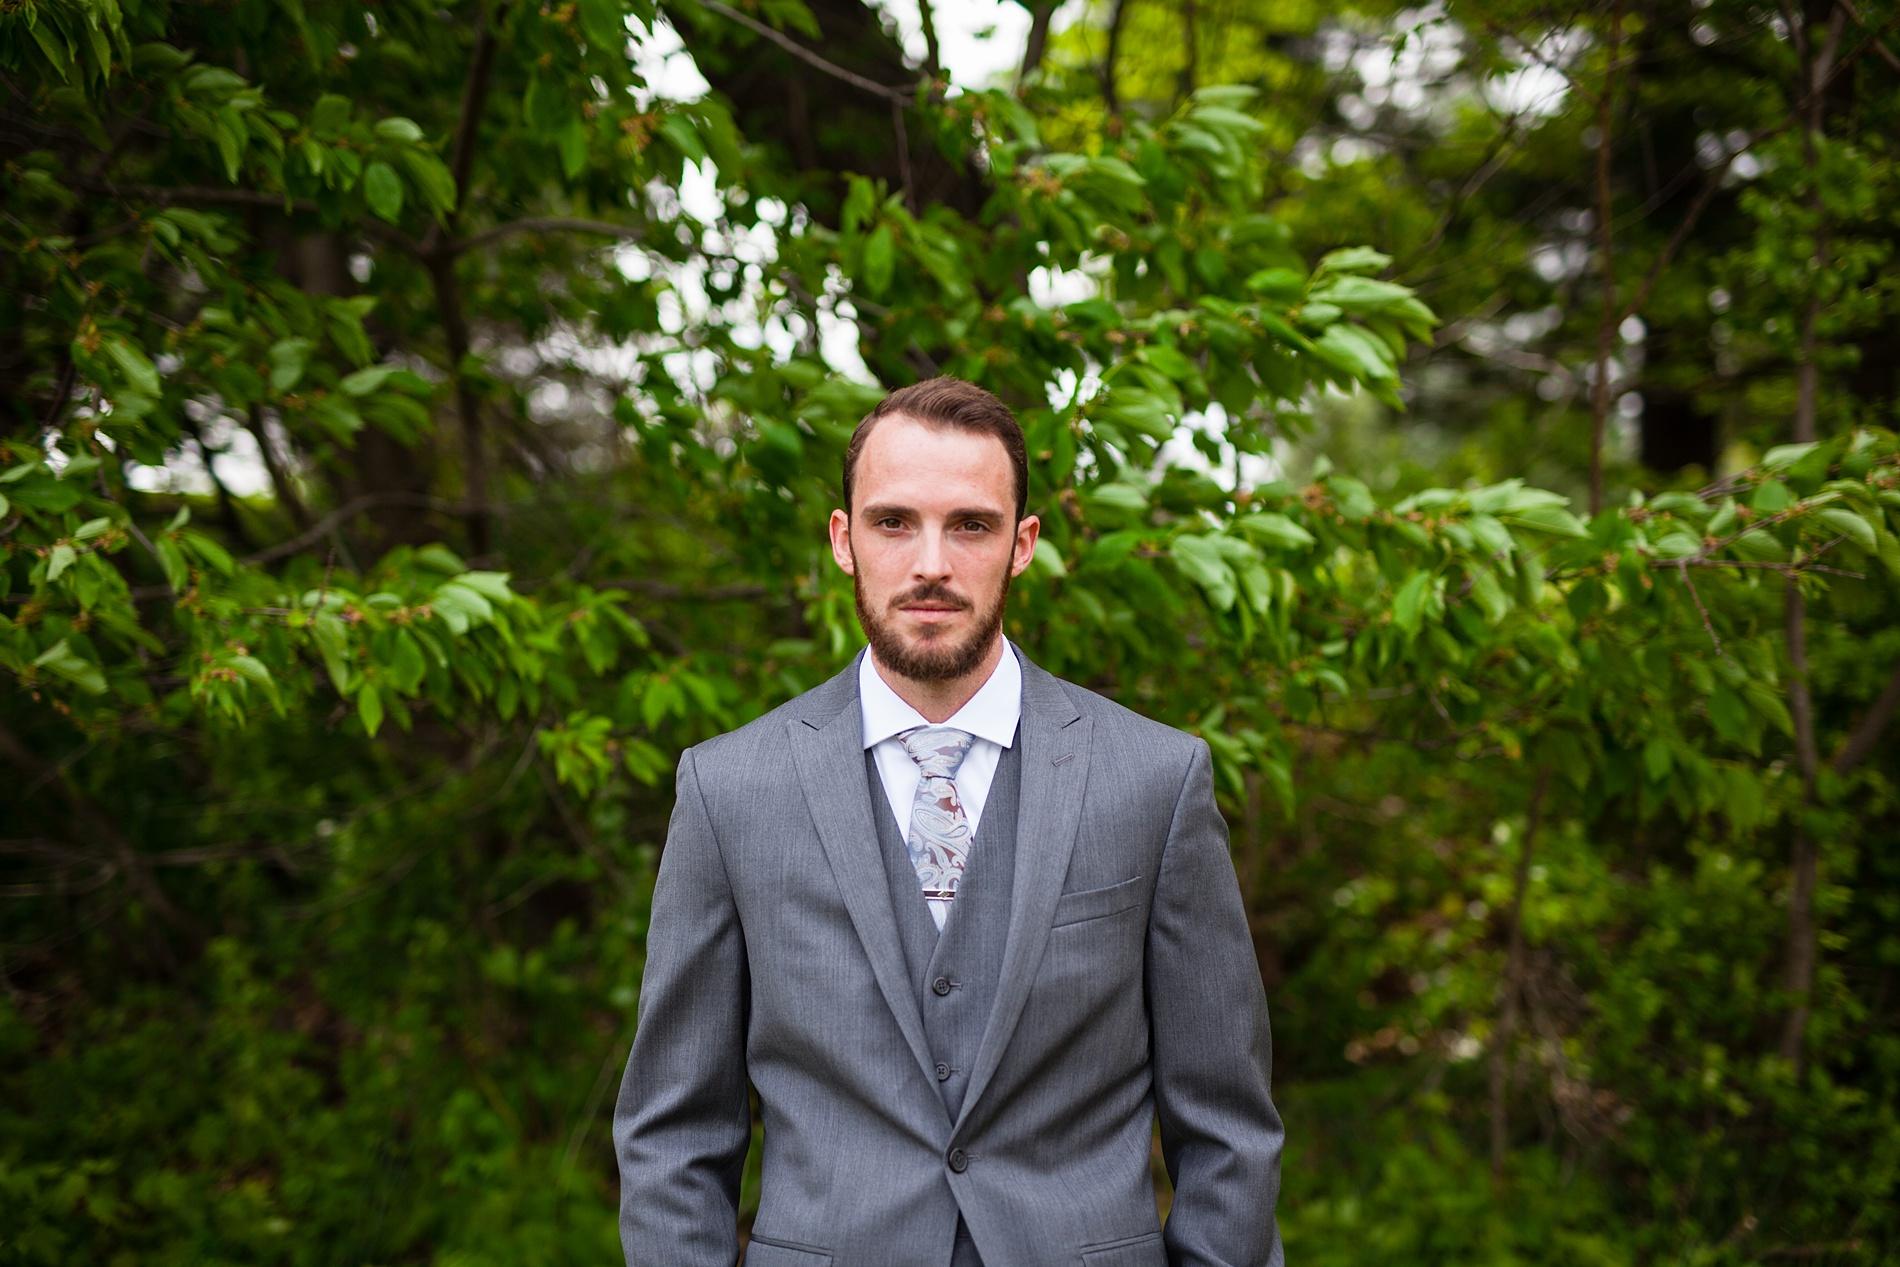 Brandon_Shafer_Photography_Brett_Autumn_Wedding_0027.jpg